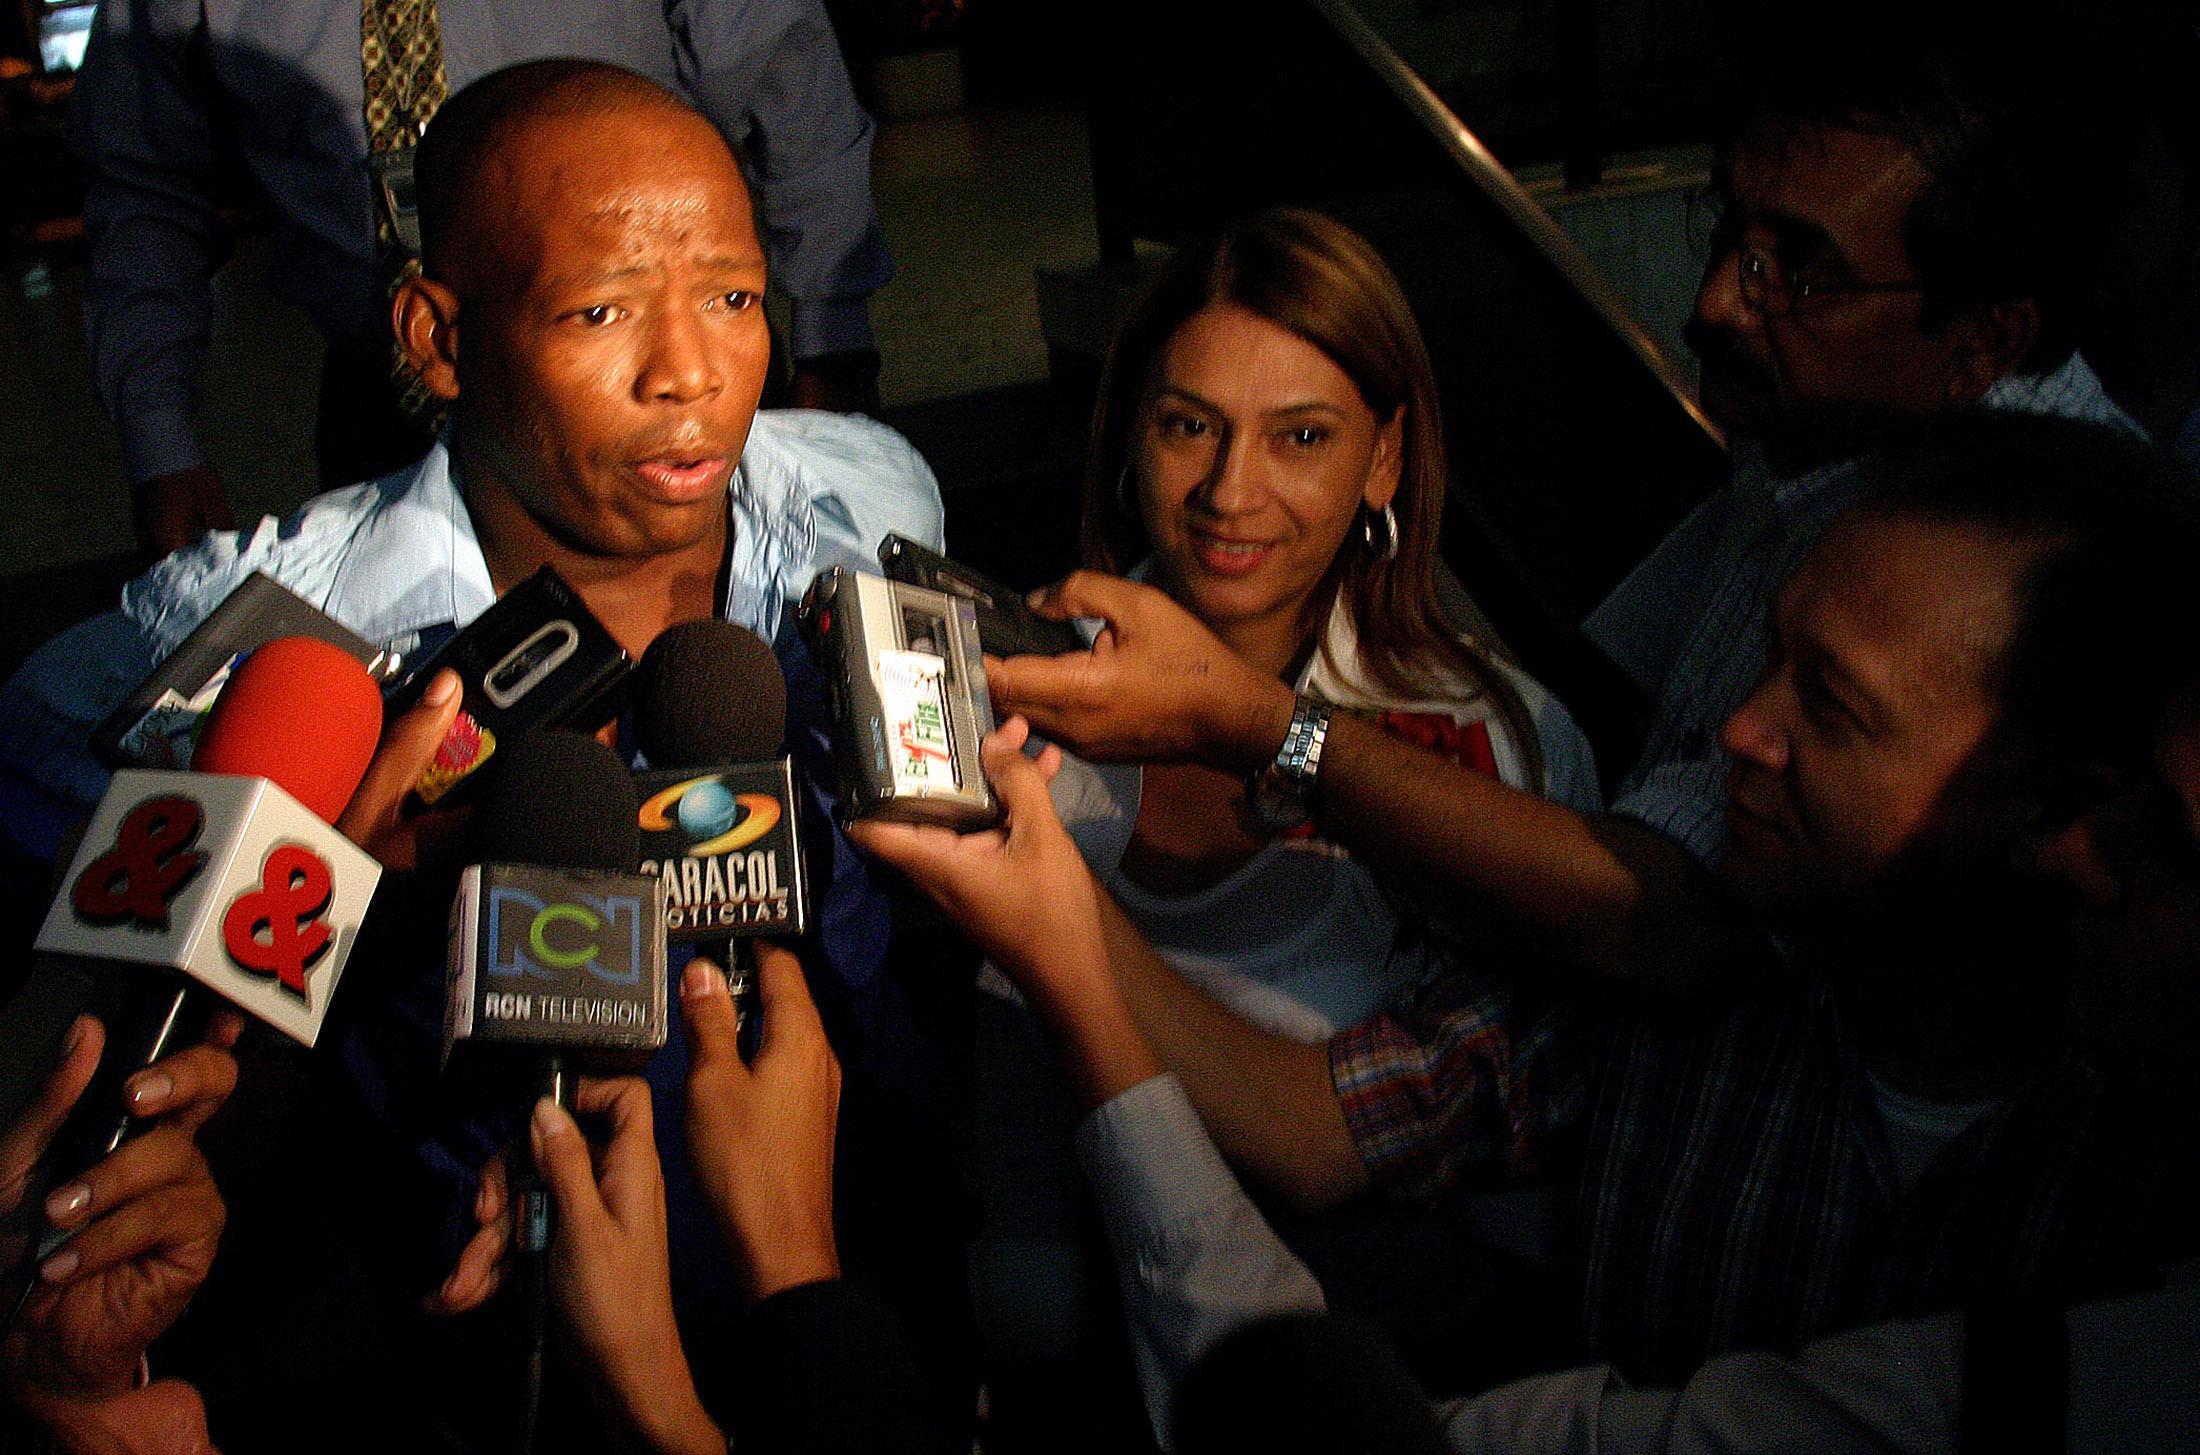 Asprilla says hitman wanted to kill Paraguay's Chilavert